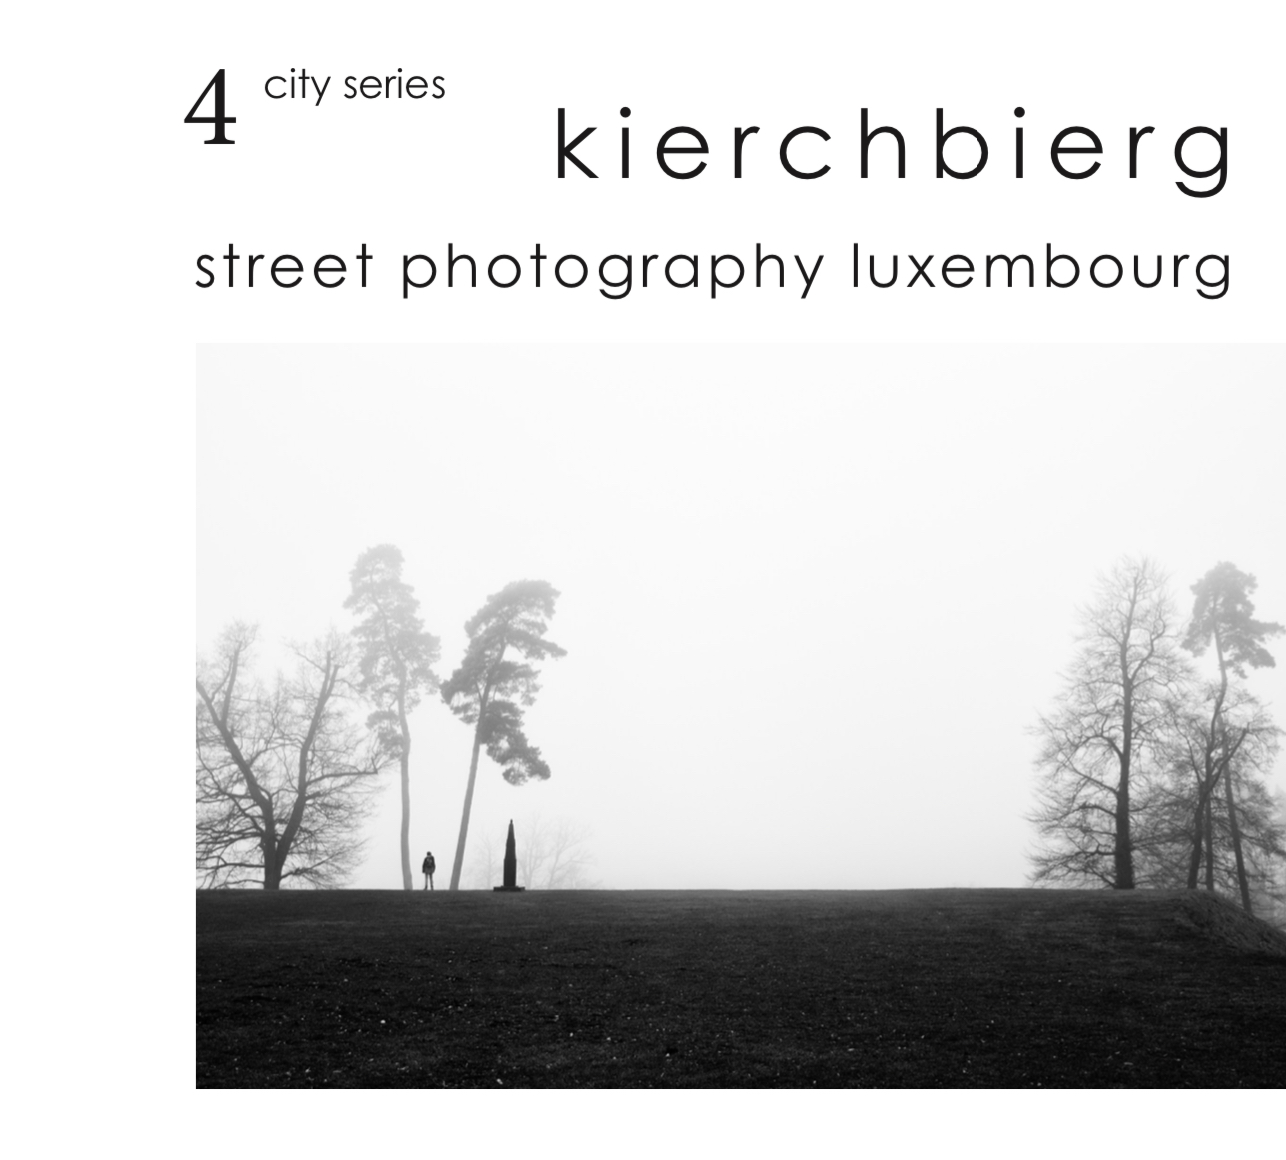 City Series 4: Kierchbierg